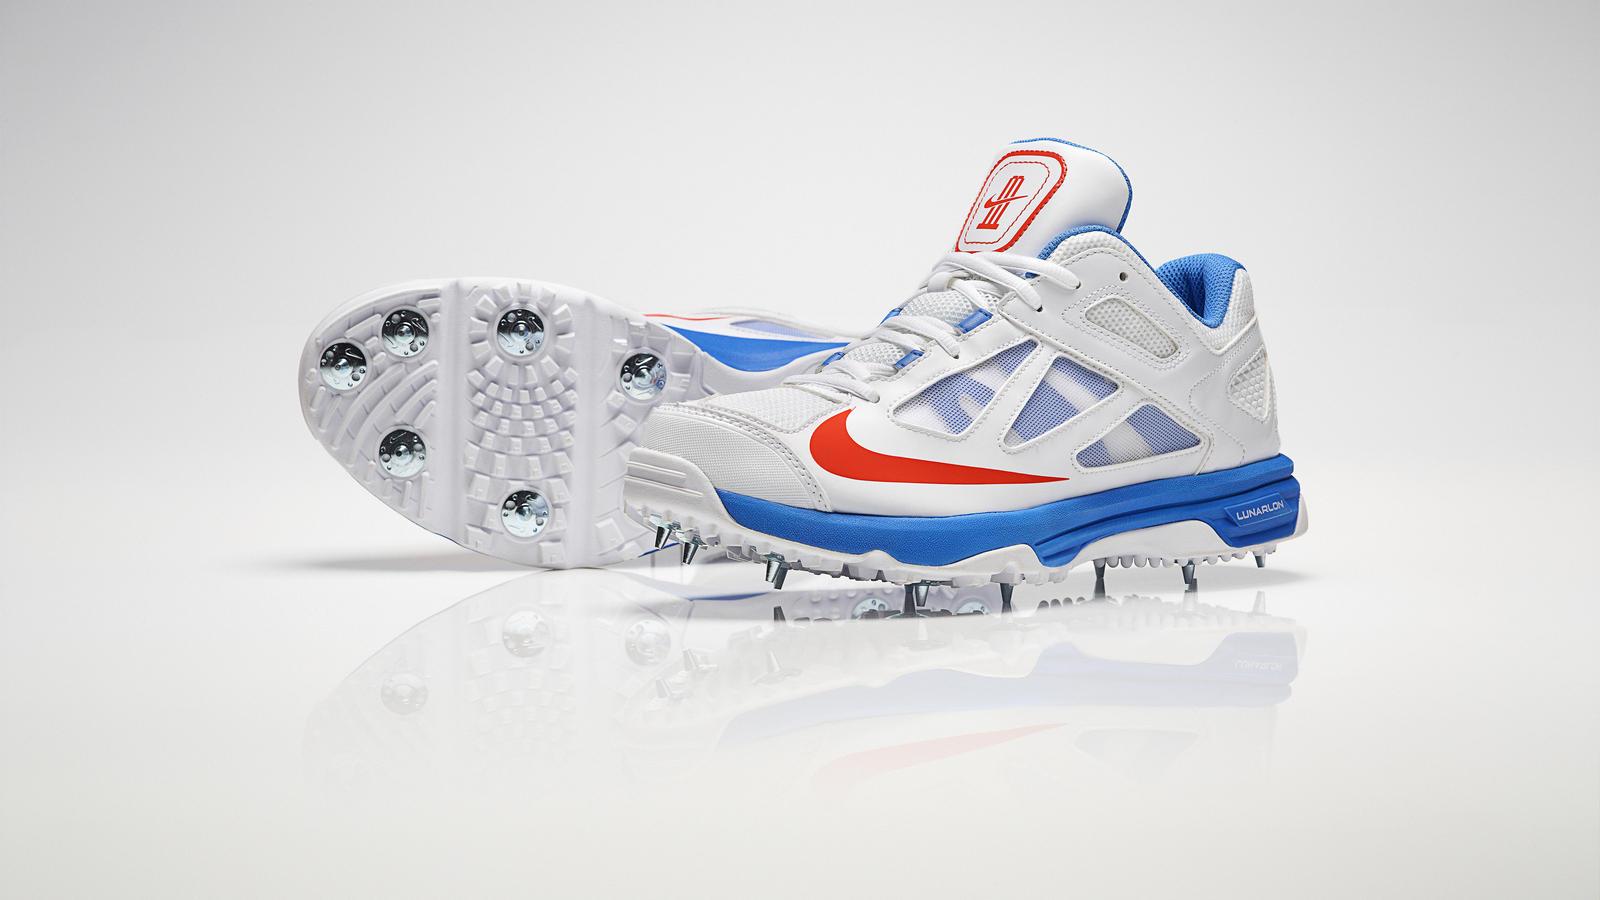 Team Indiau0027s R. Ashwin helps Nike unveil innovative cricket shoes